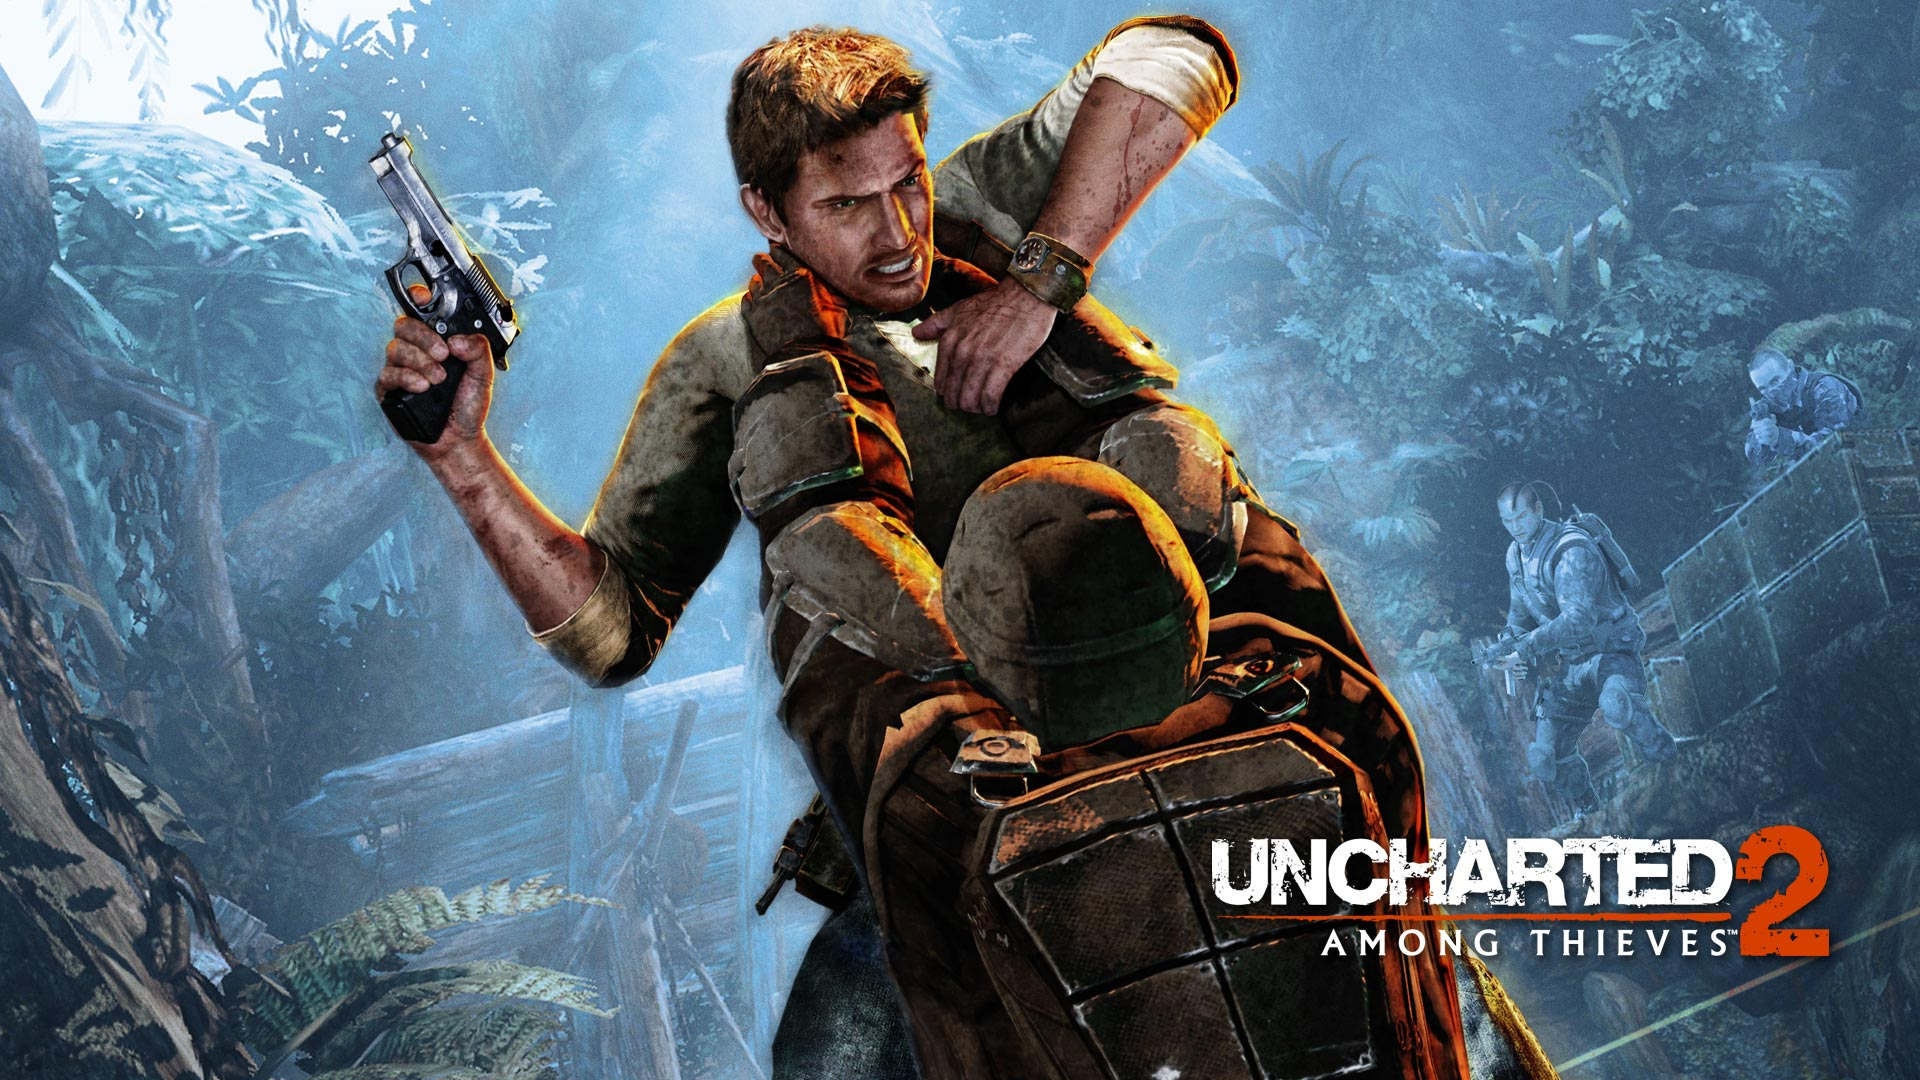 Uncharted 2 Hd Wallpaper